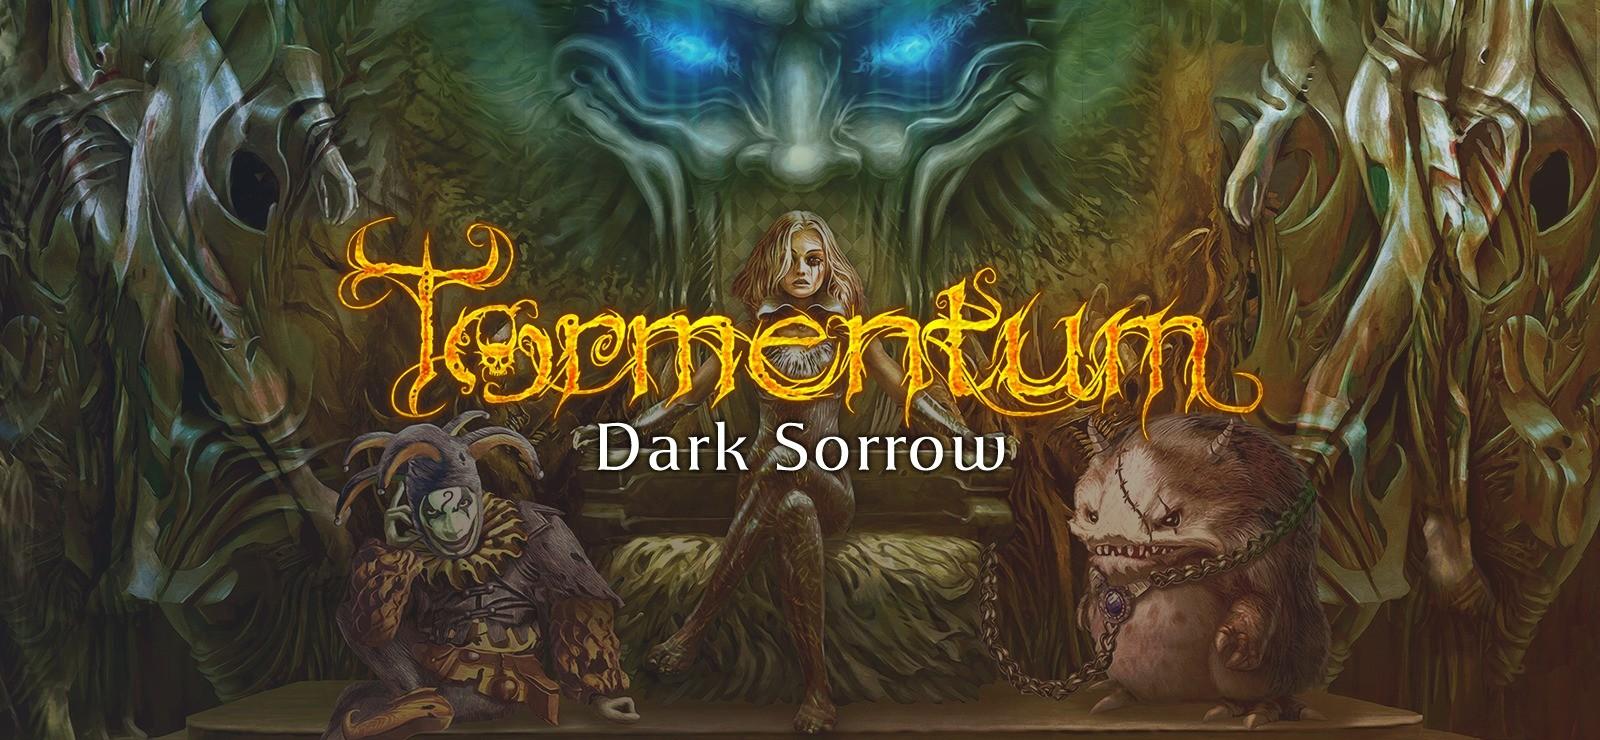 Tormentum Dark Sorrow – 2015